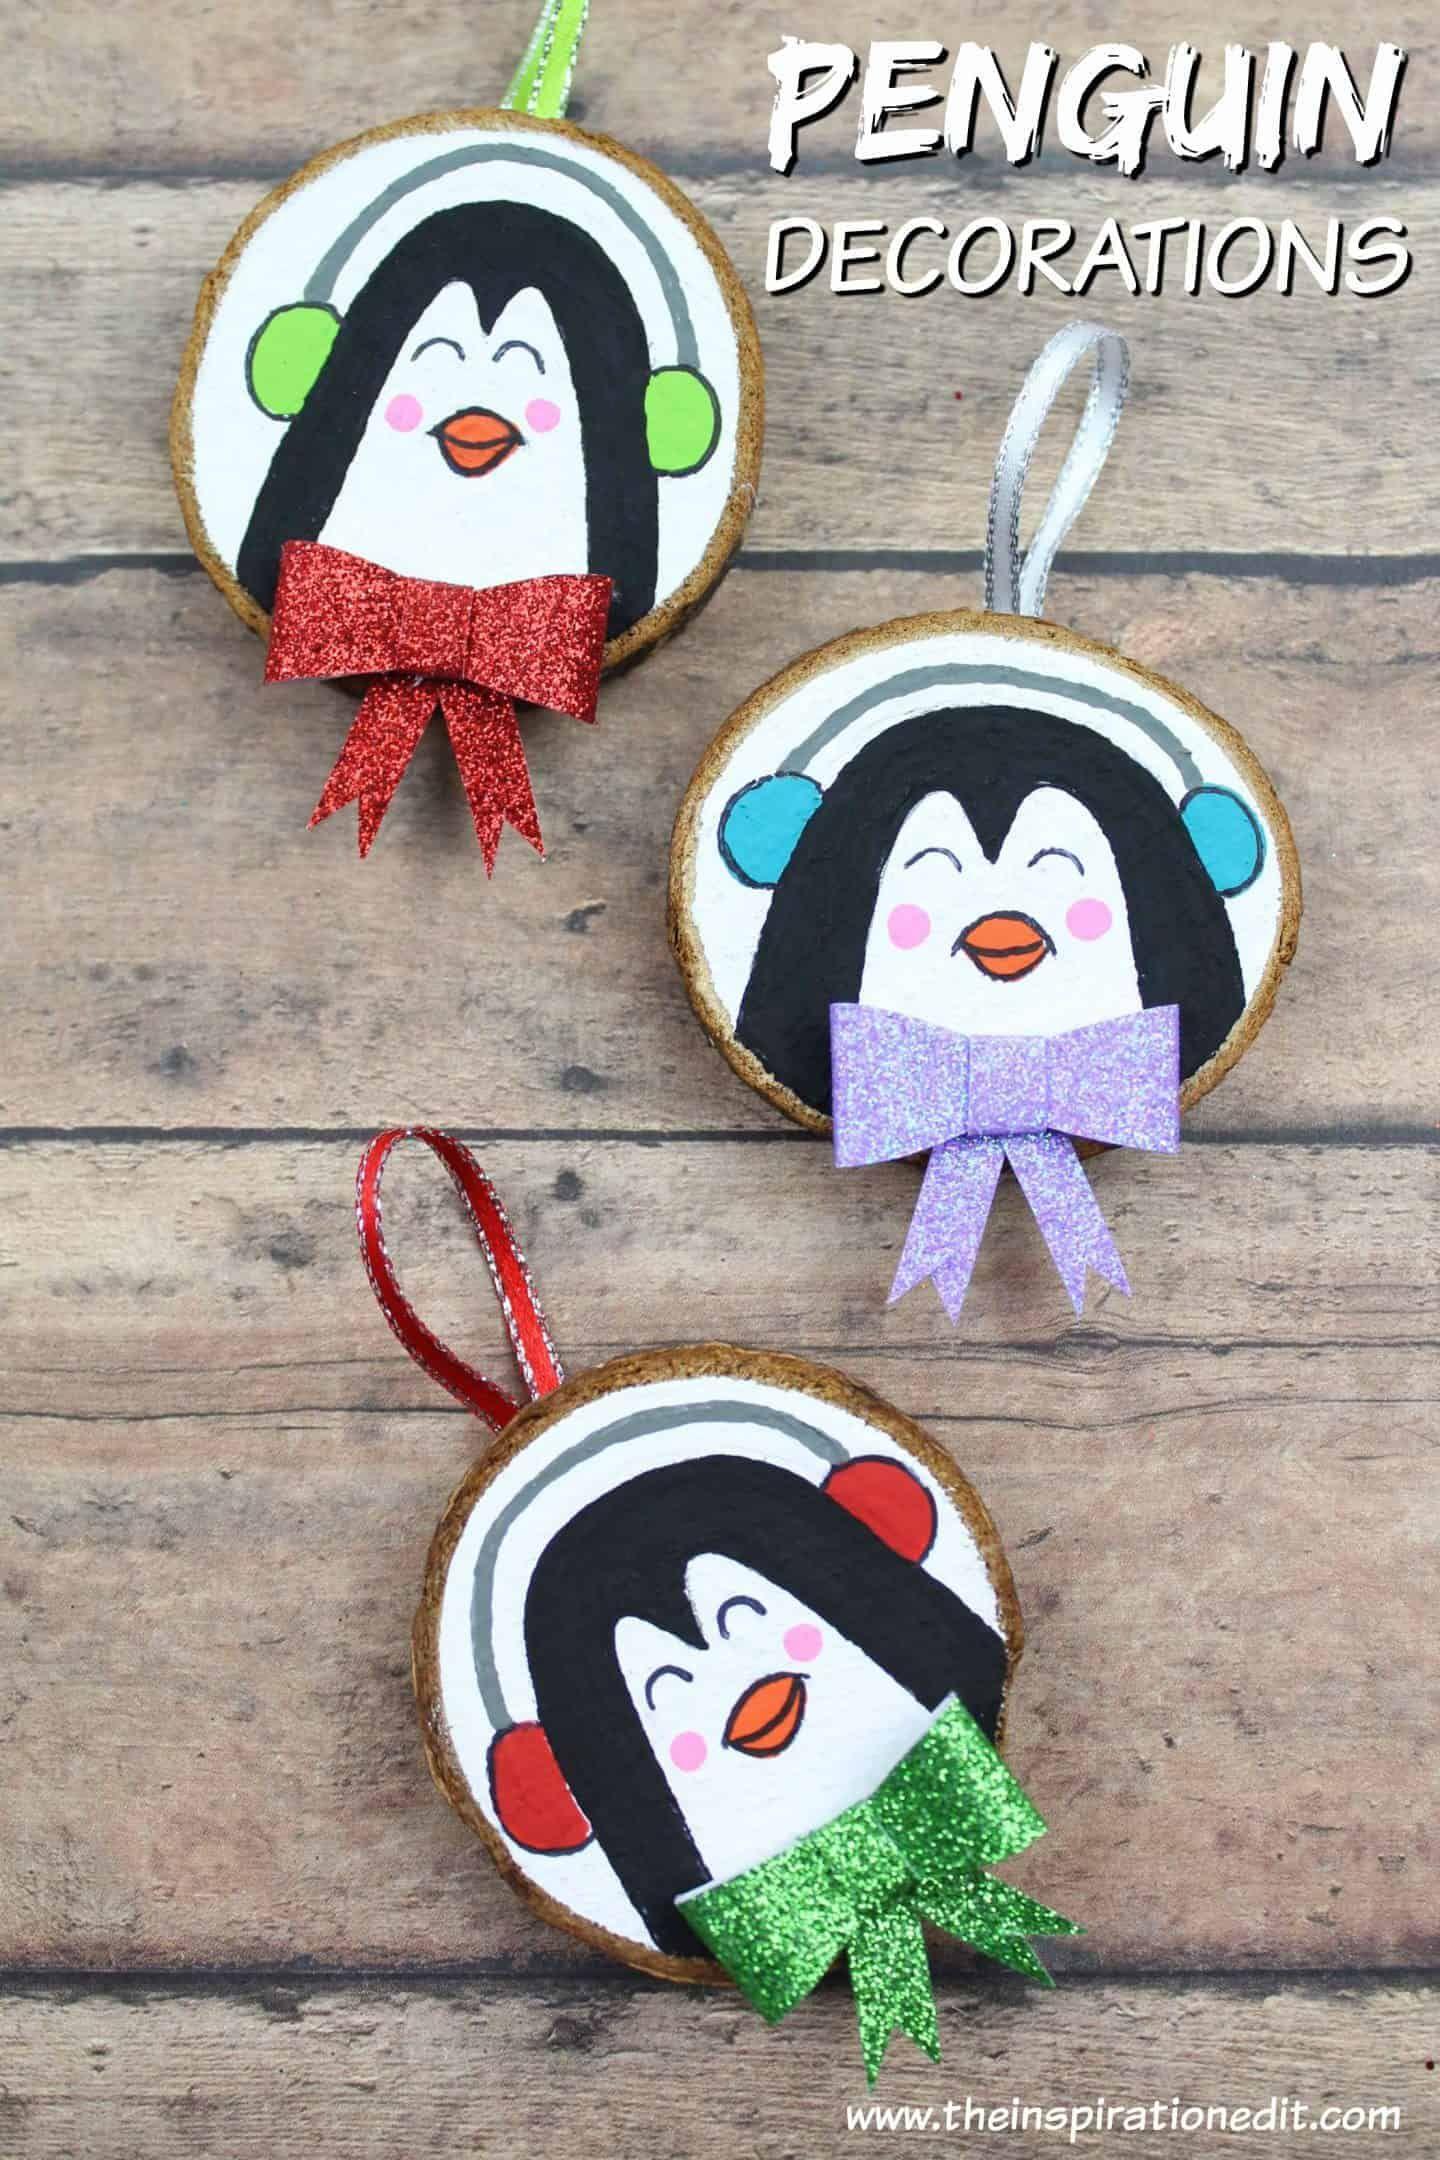 Diy Penguin Decoration Craft For Christmas Penguin Decor Diy